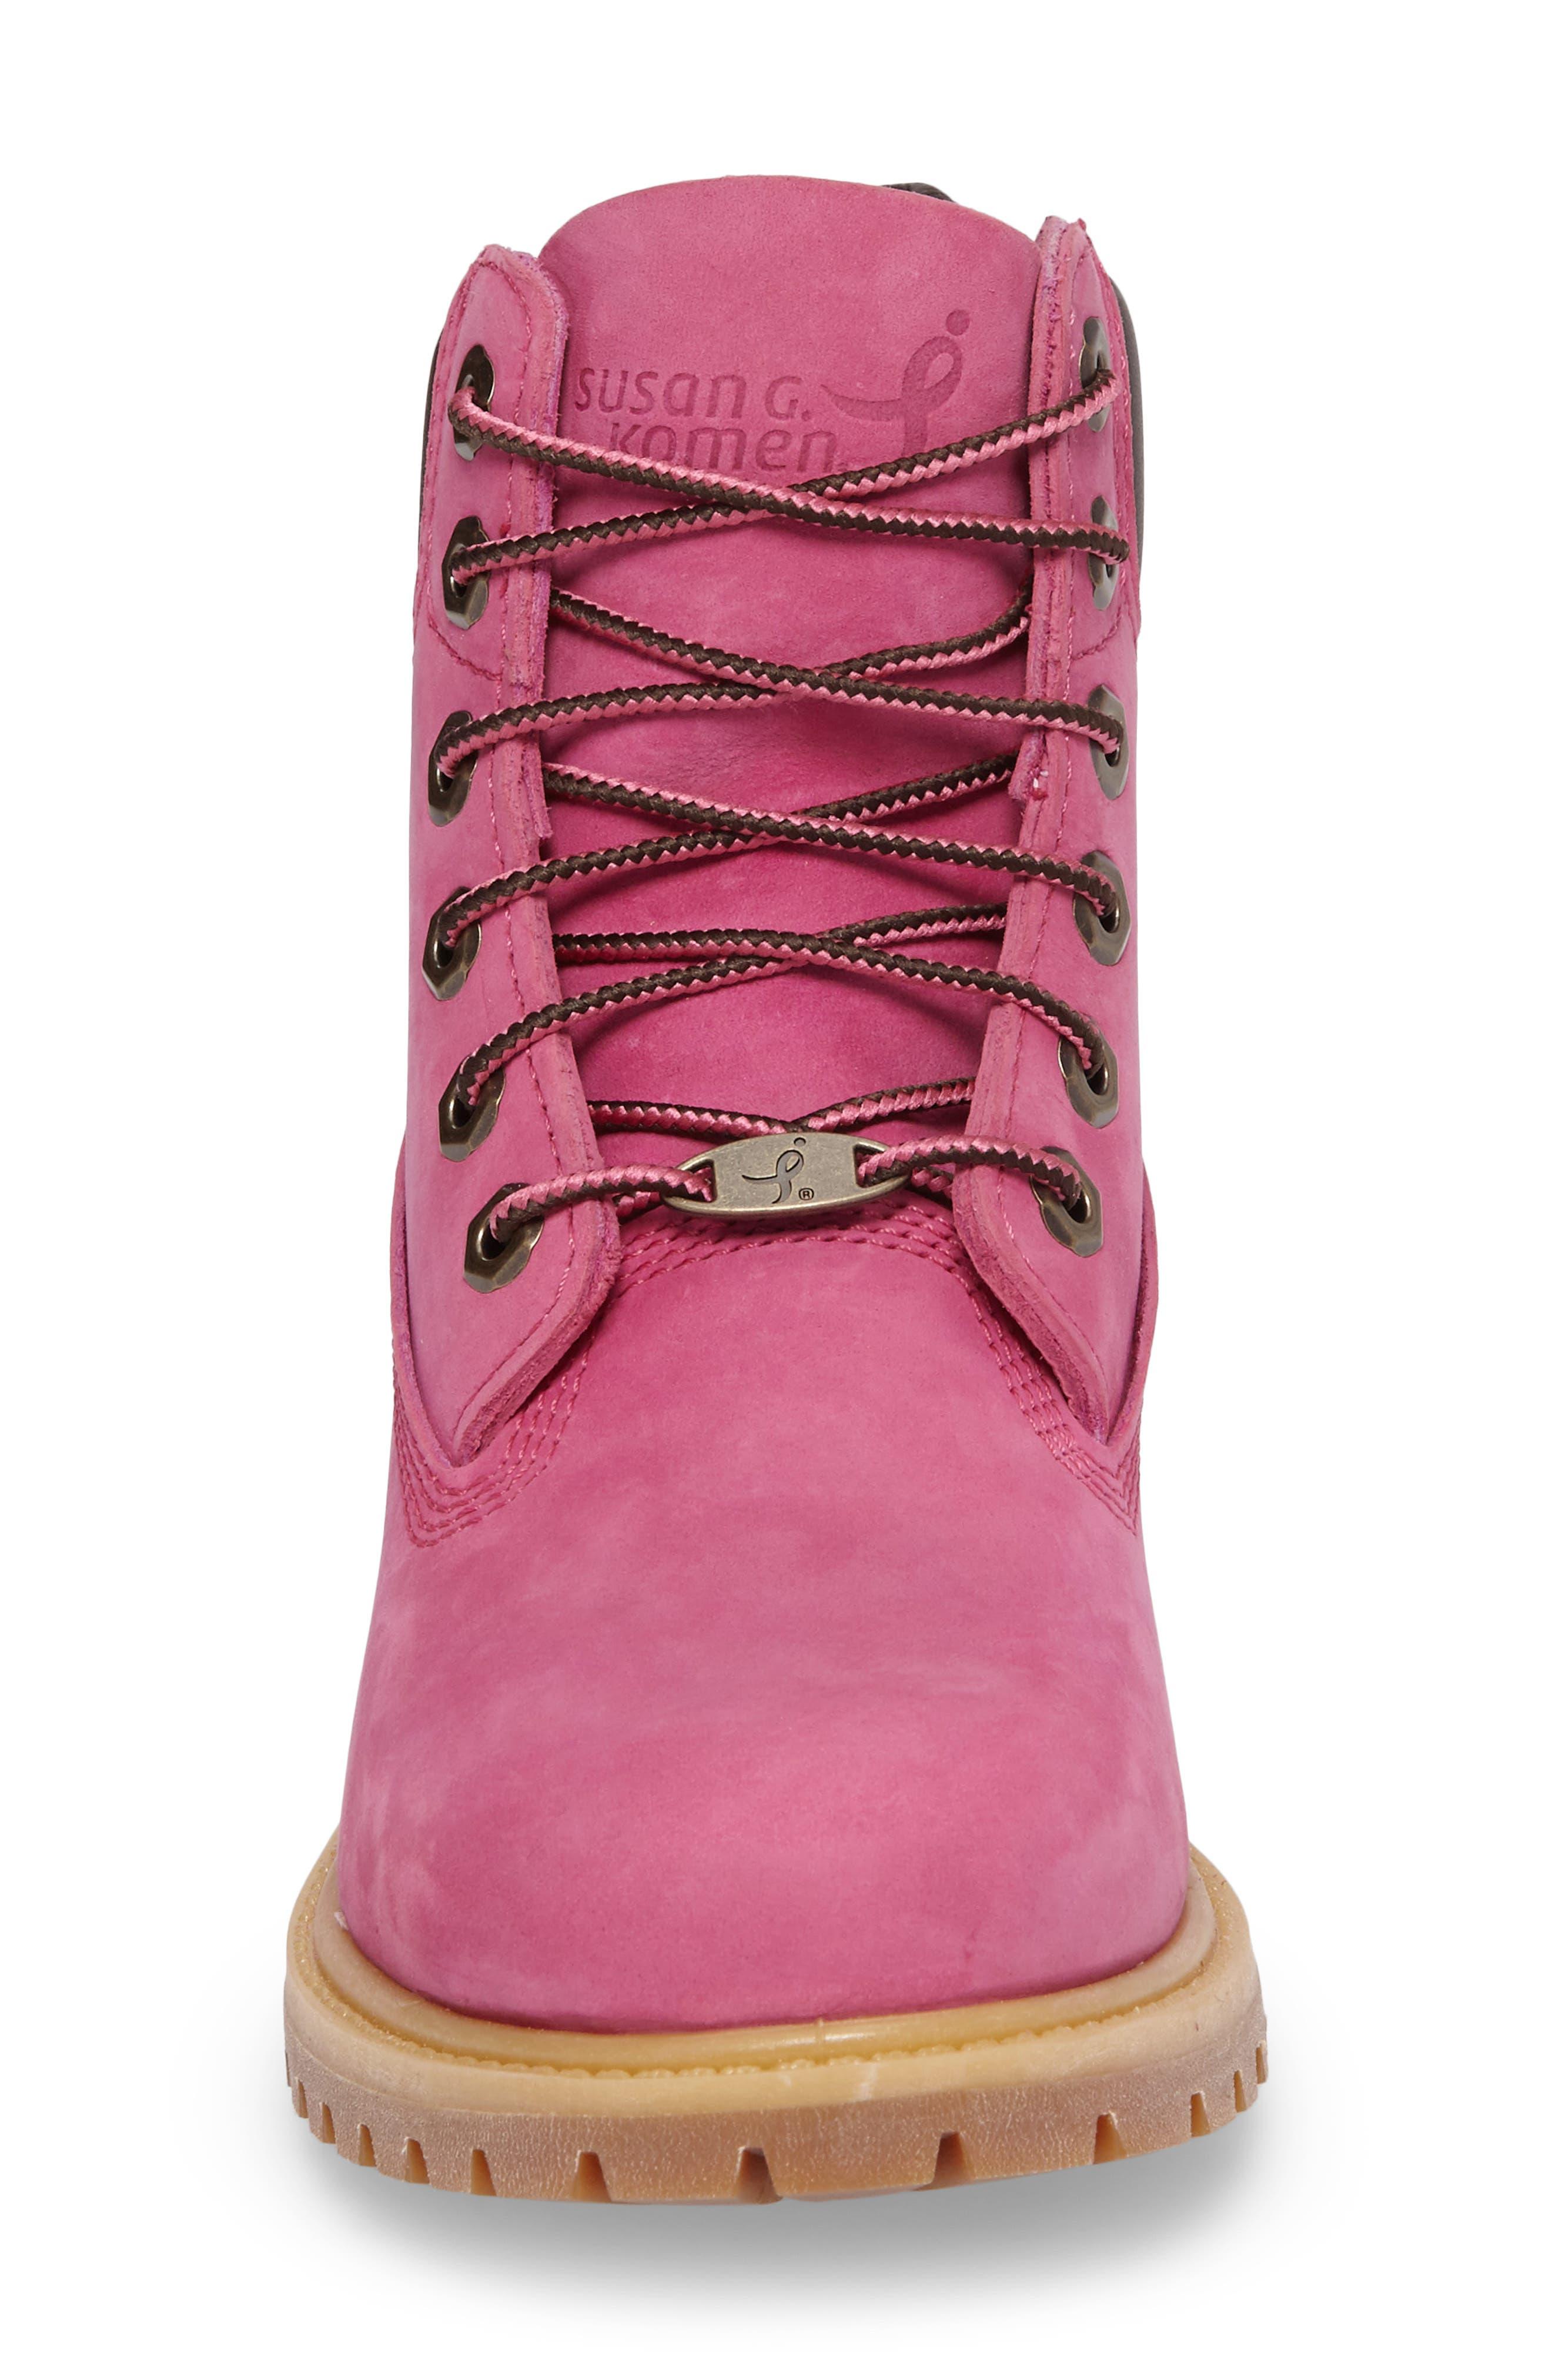 x Susan G. Komen 6-Inch Waterproof Insulated Boot,                             Alternate thumbnail 4, color,                             678